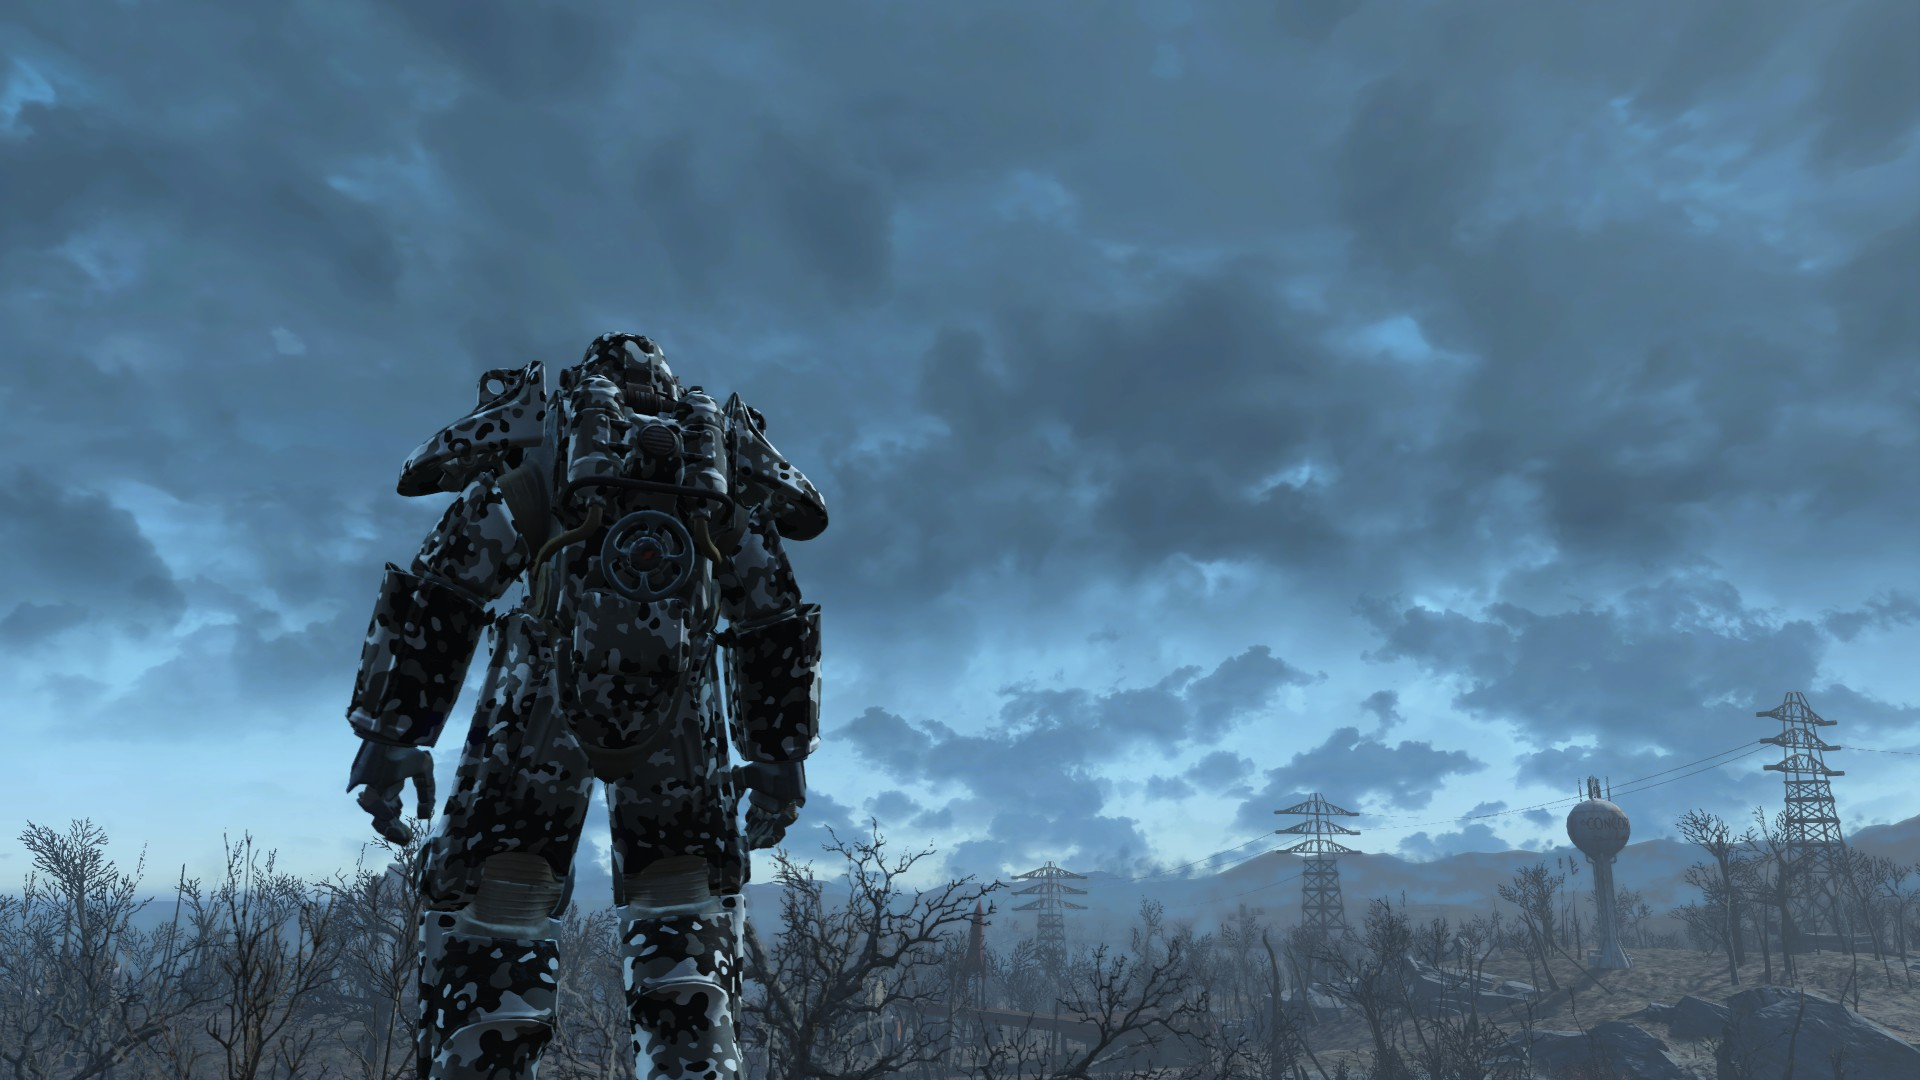 20190406162936_1.jpg - Fallout 4